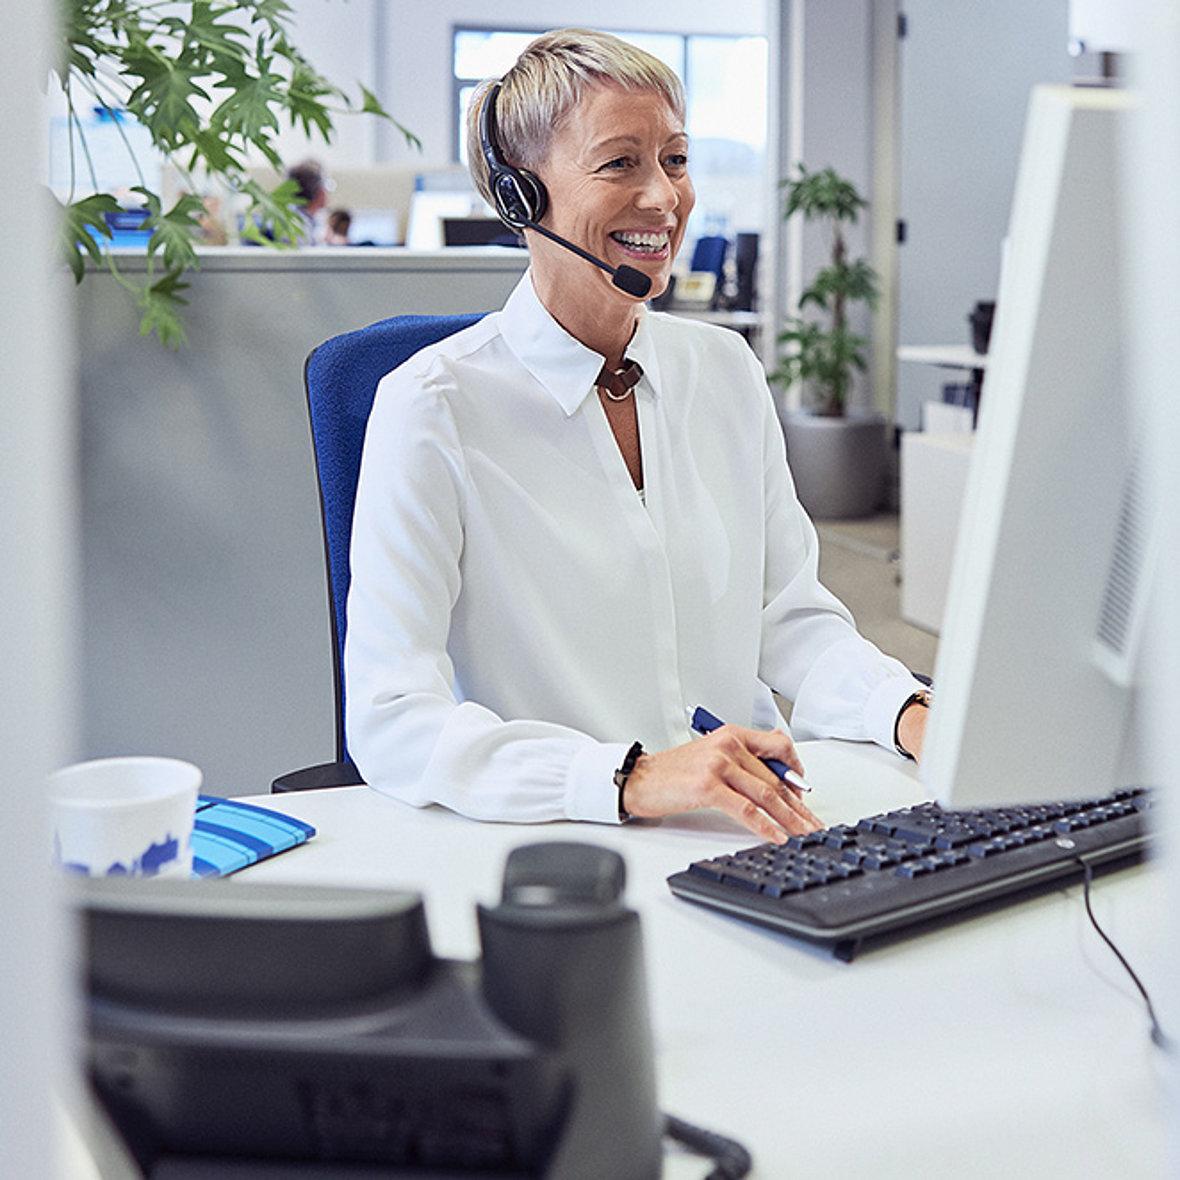 Telefonierende Frau mit Headset an Computer